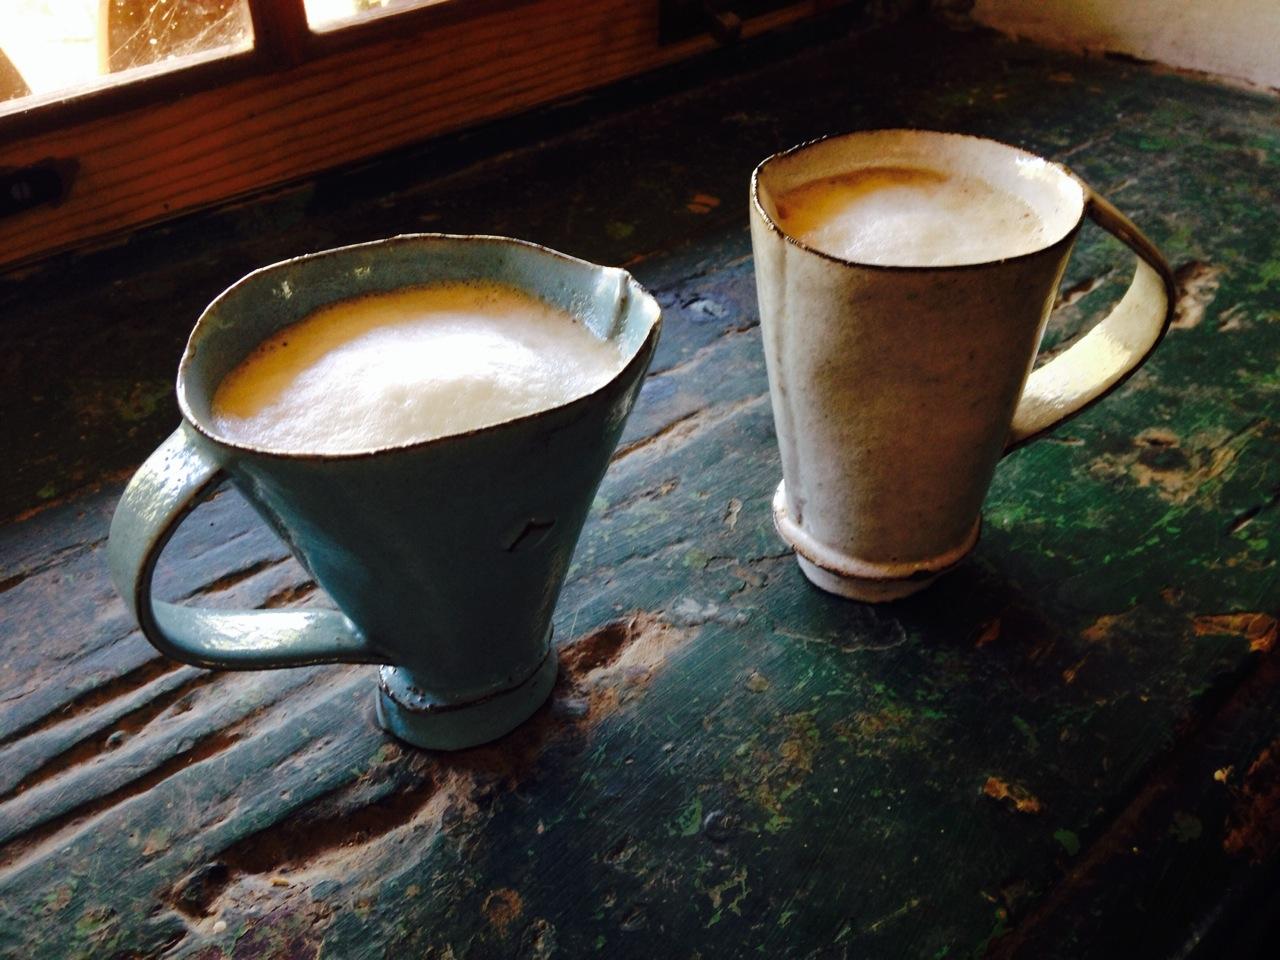 clementina ceramics cappuccinos in calitzdorp